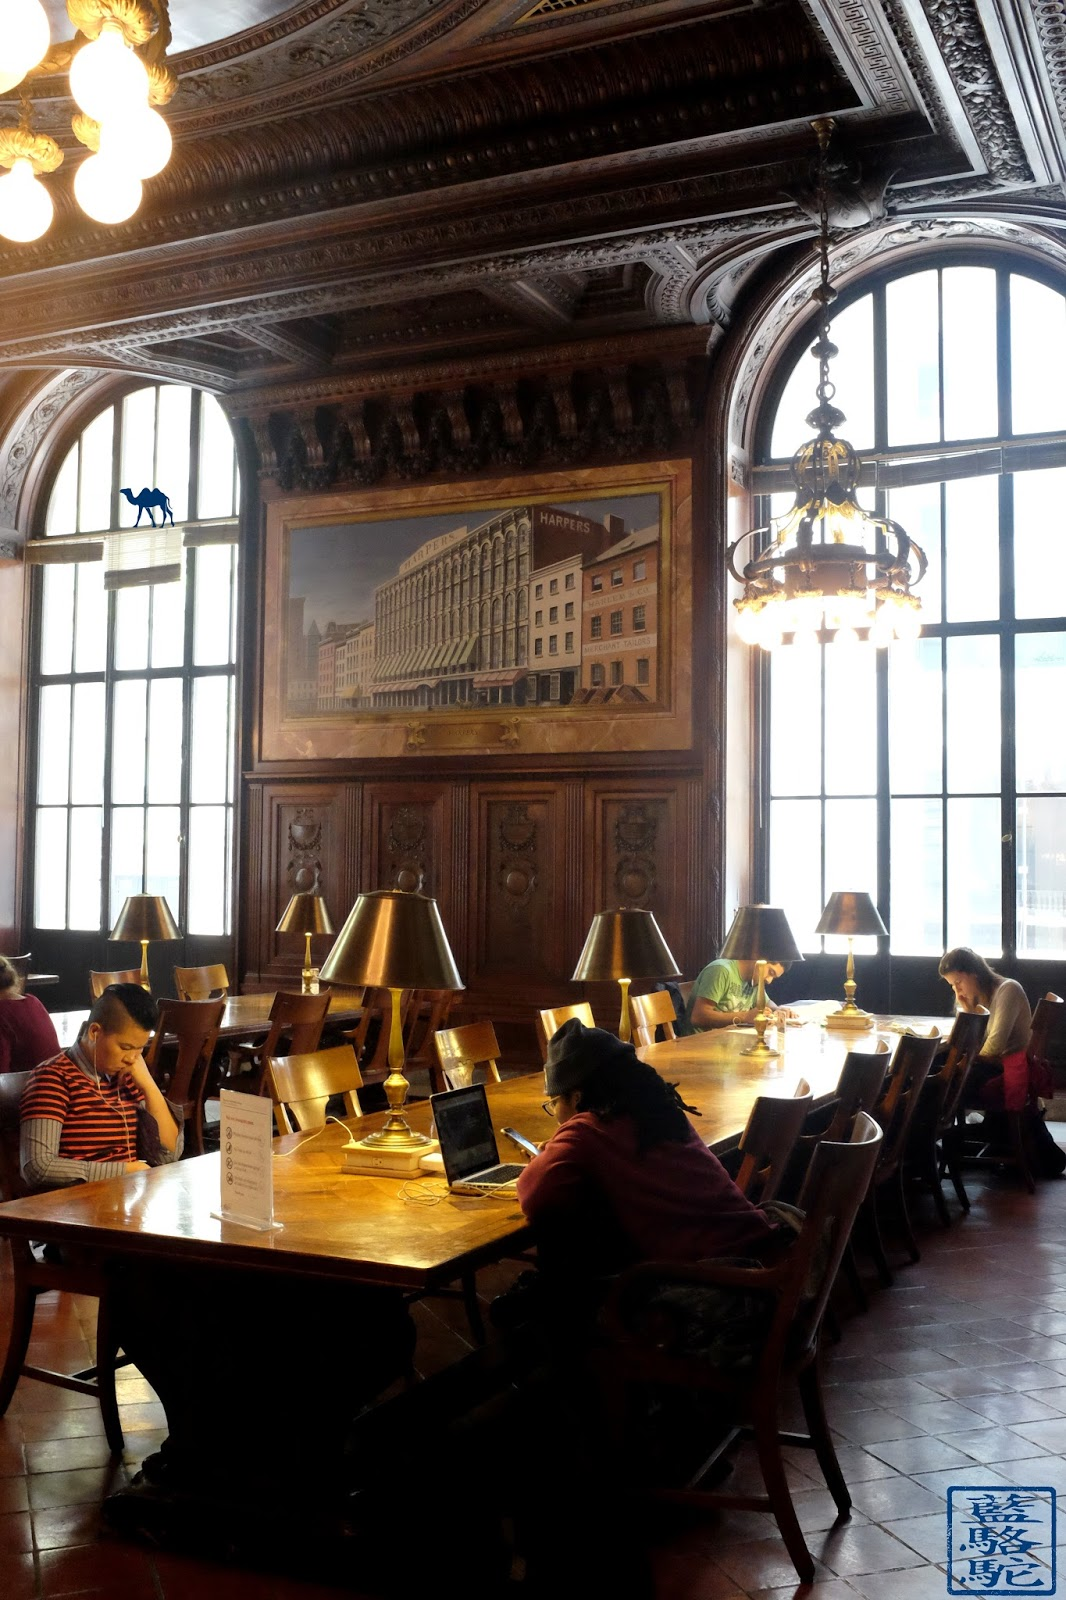 Le Chameau Bleu - La DeWitt Wallace Periodical Room